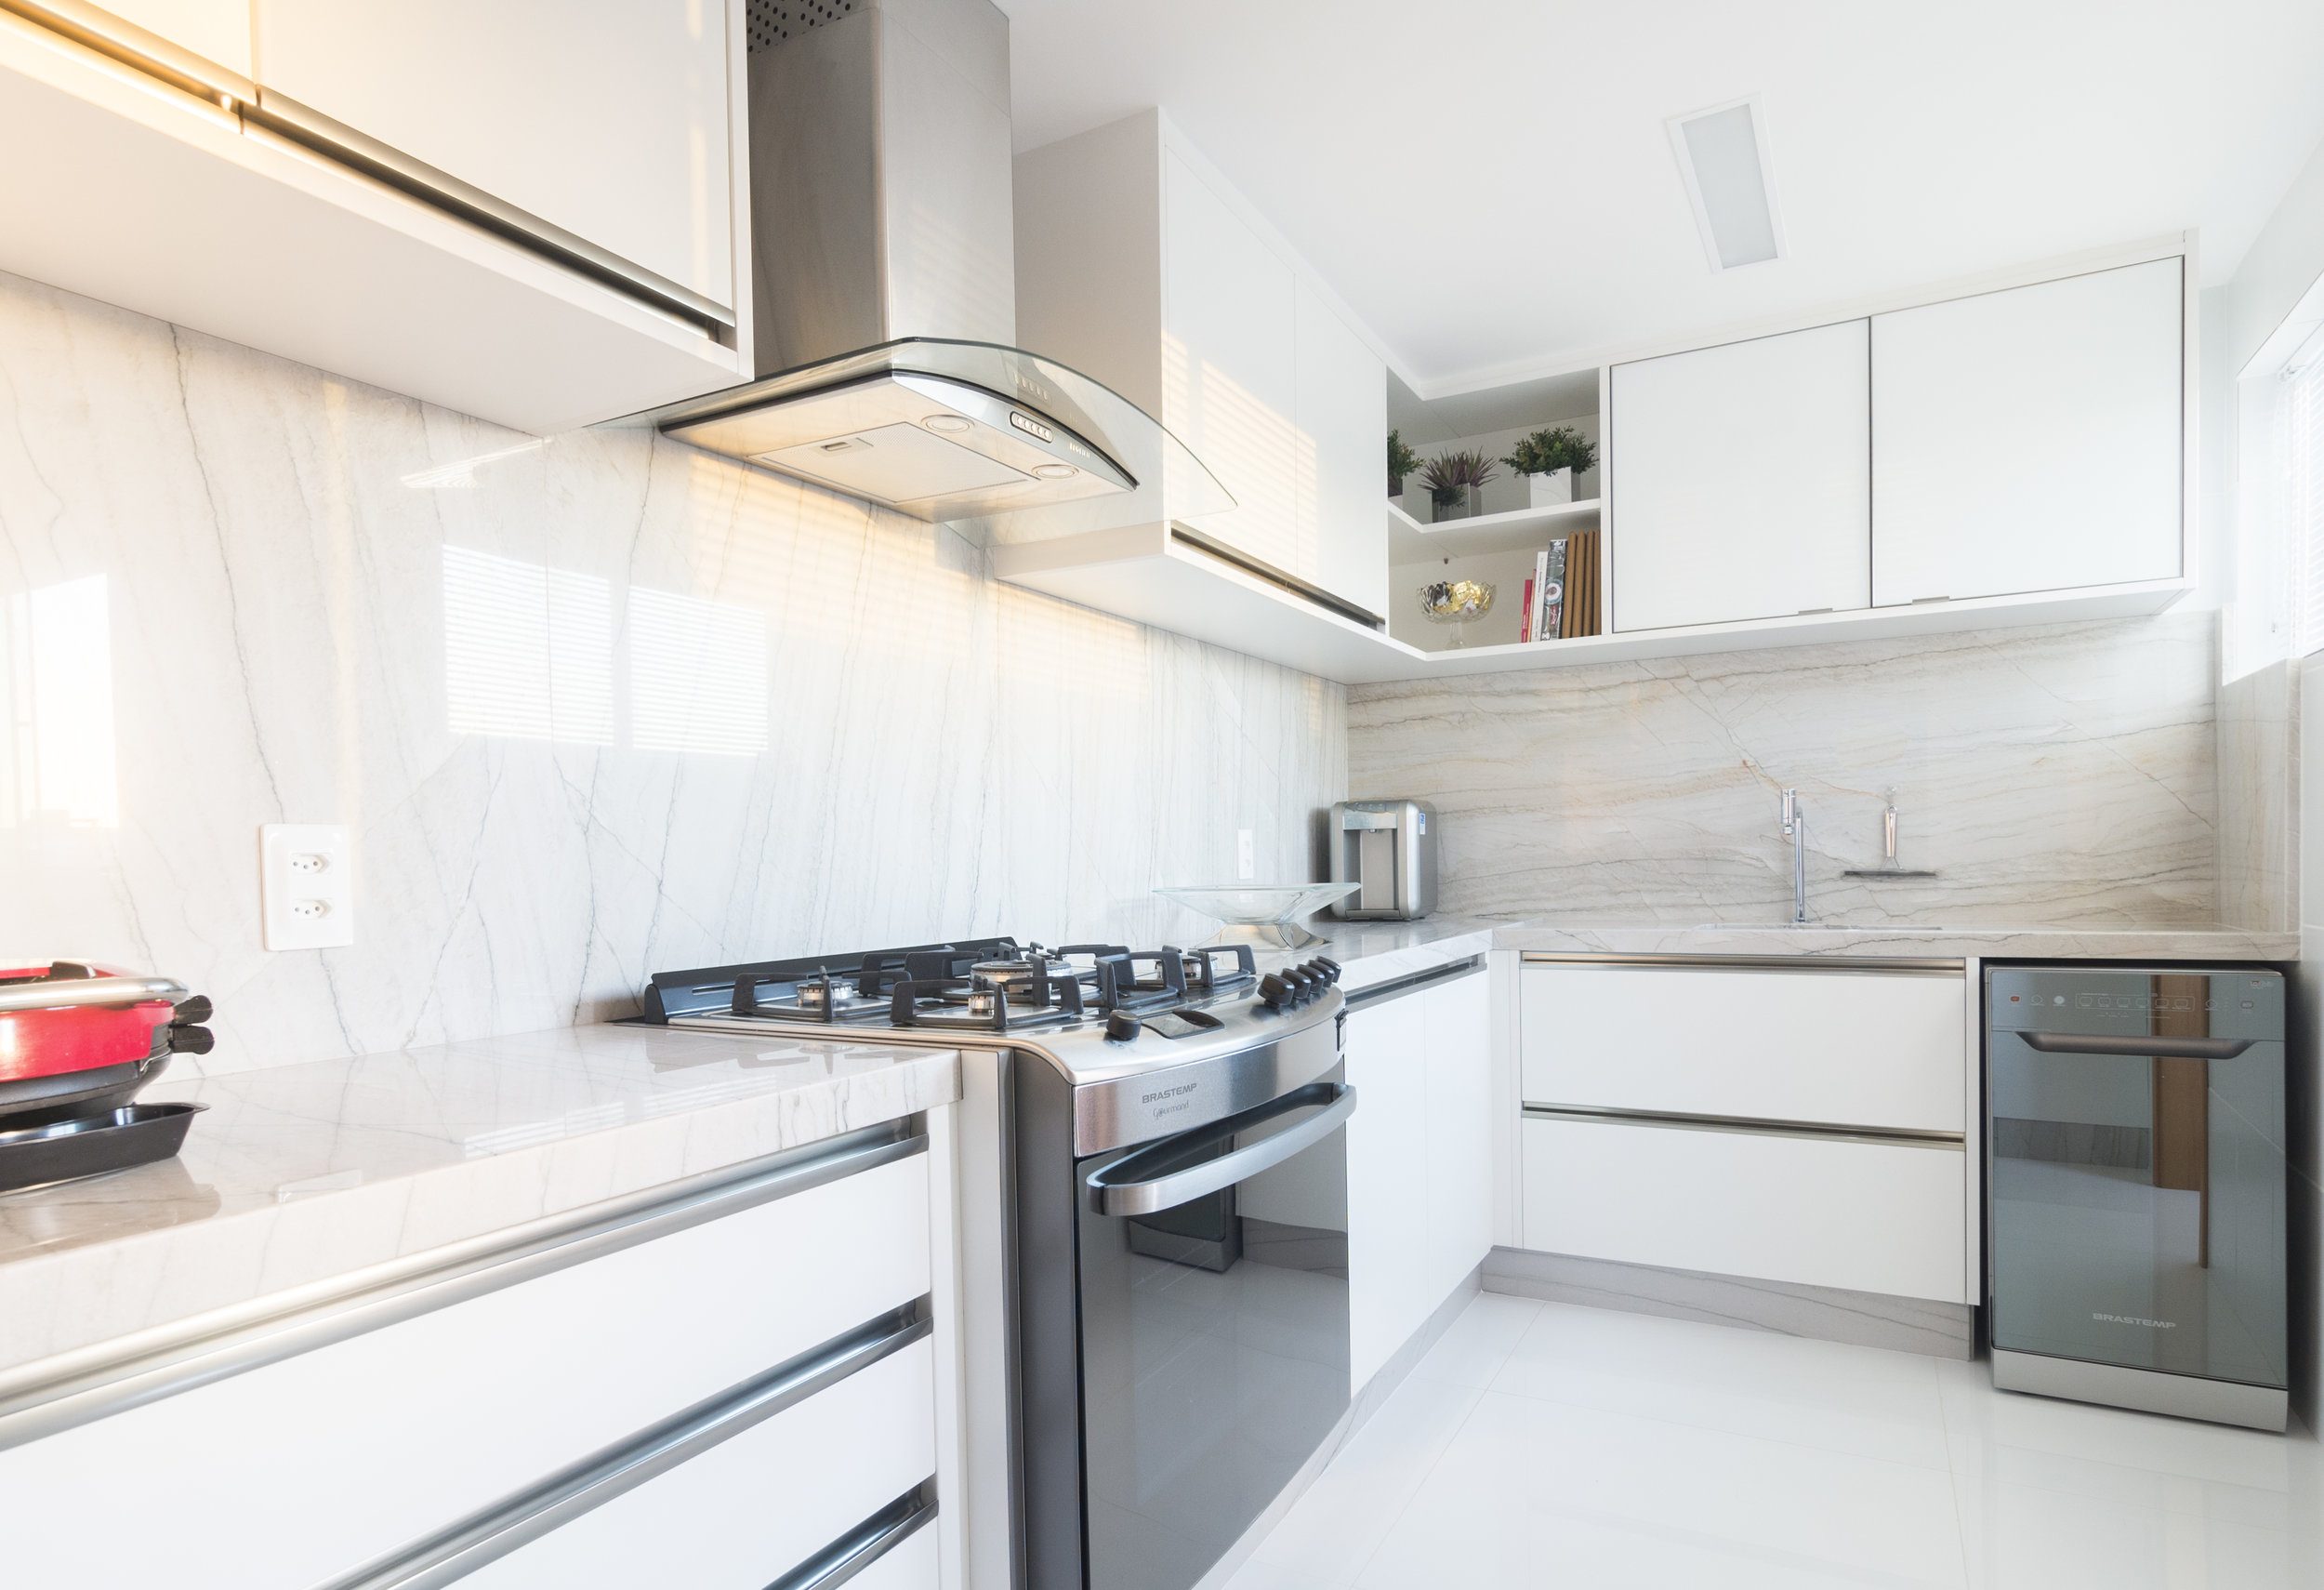 projeto-arquitetonico-robertoindira-duo-arquitetura-apartamentos-cozinha-03.jpg